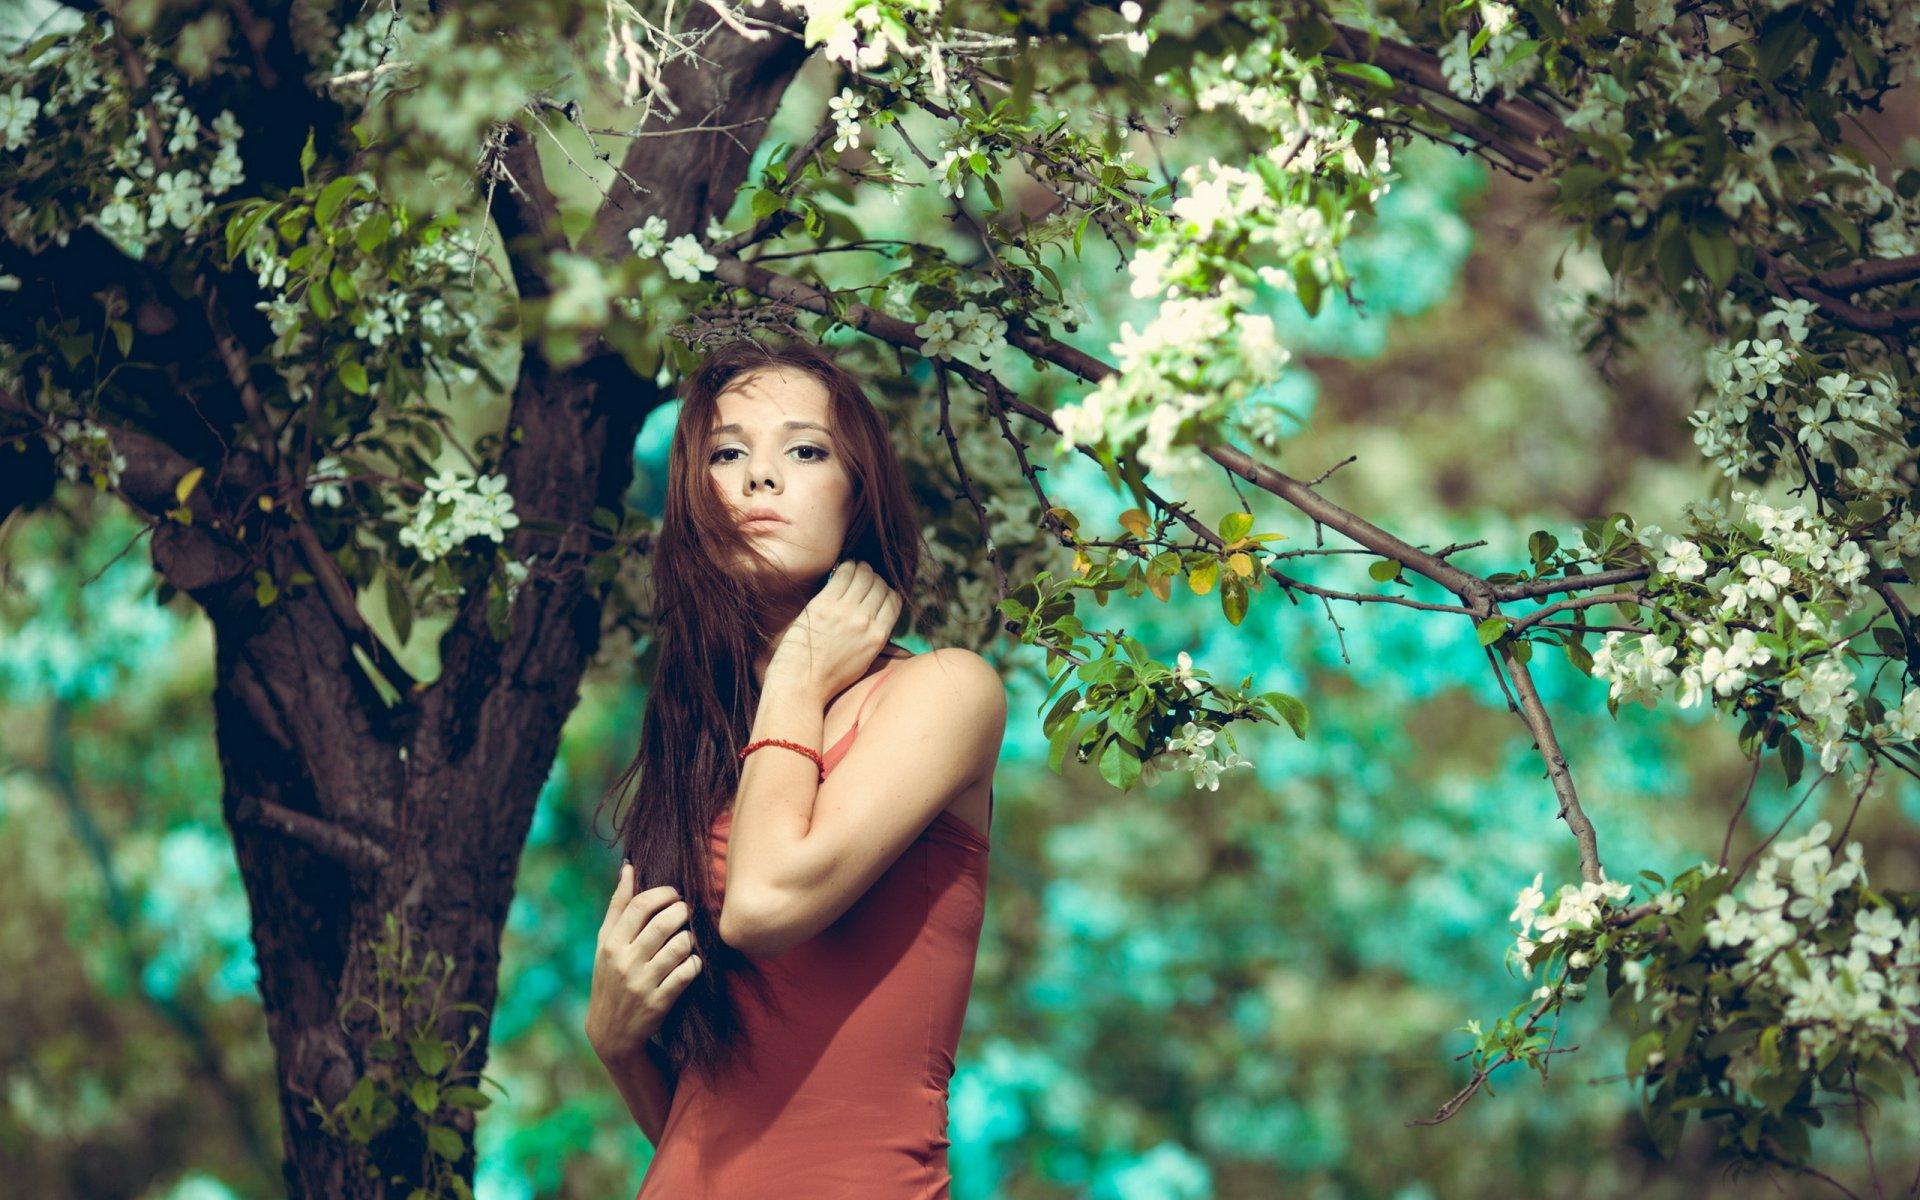 девушки около дерева один такой